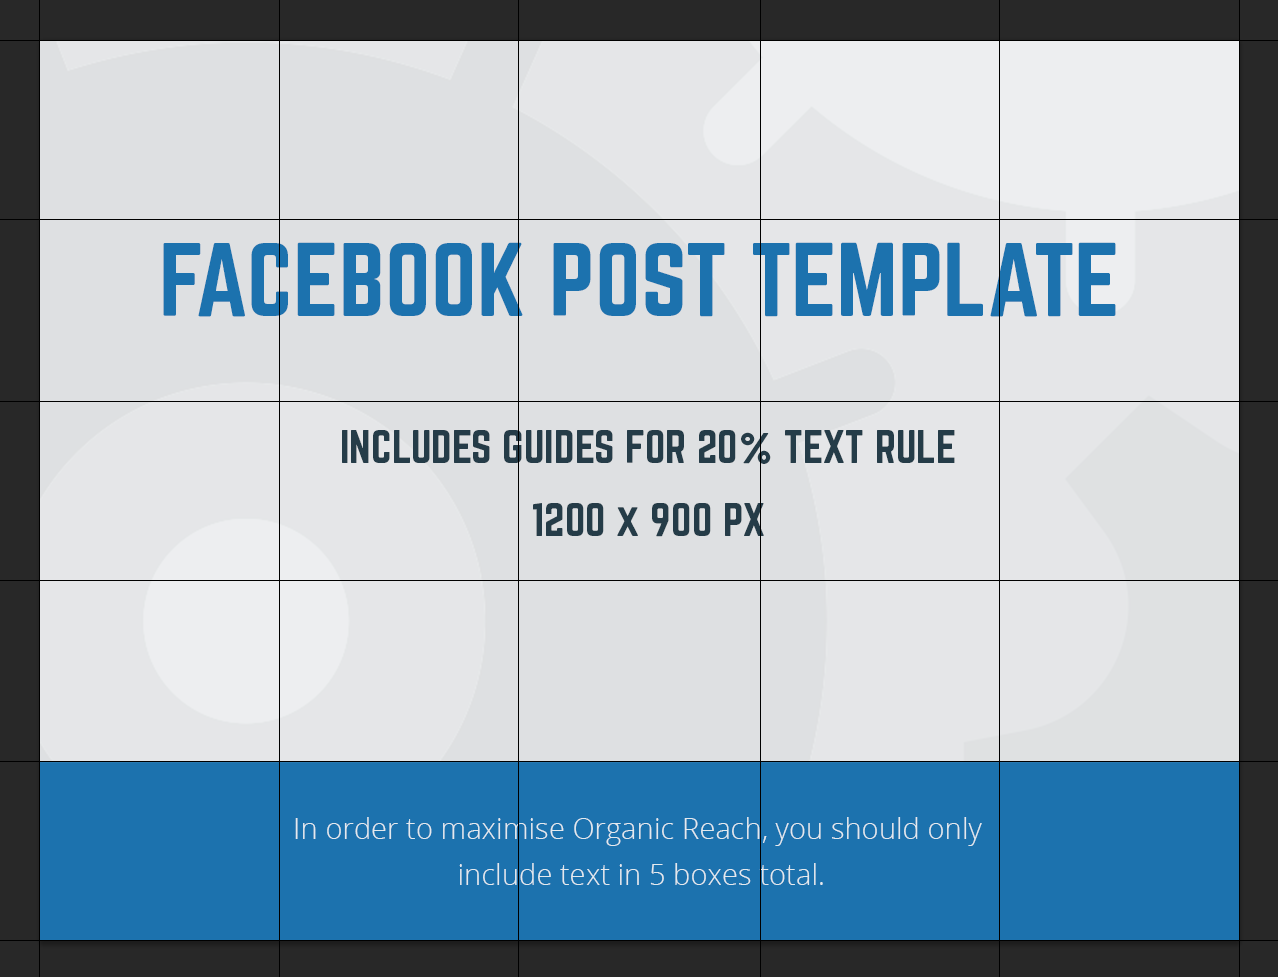 Facebook Post Template 2018.